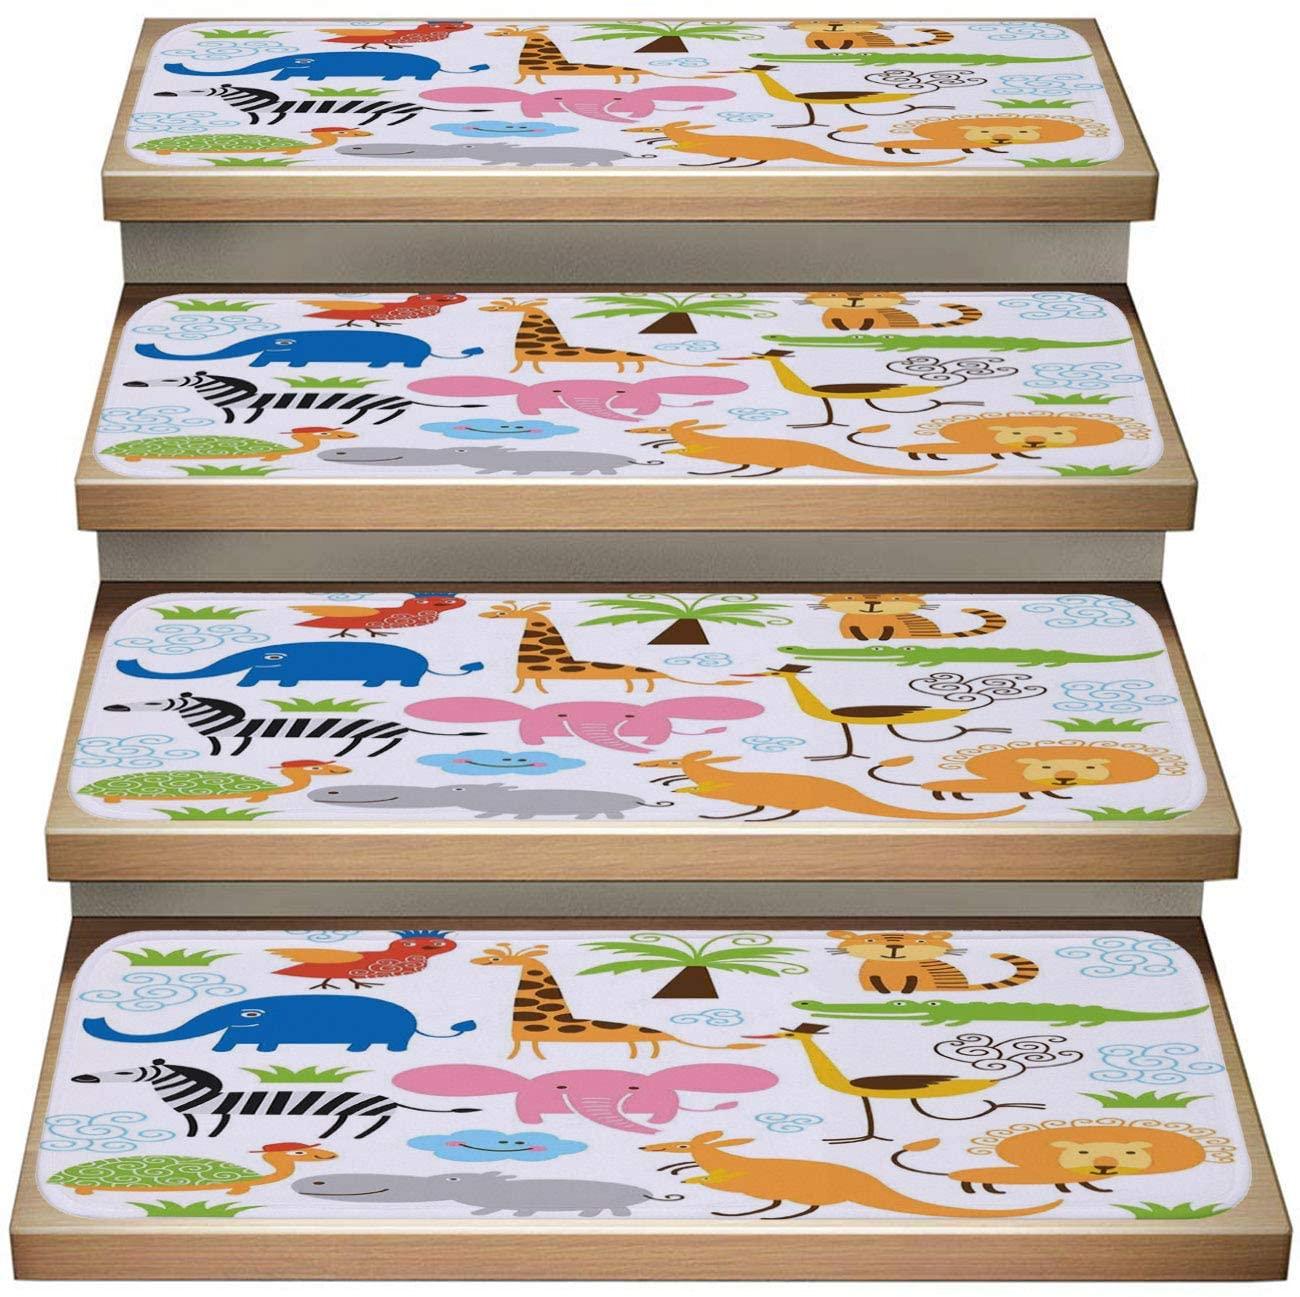 Cartoon Animal 7-Pack Non-Slip Carpet Stair Treads Set,Animal Cute Set Giraffe Elephant Turtle Kids Nursery Baby Themed Cartoon Comic Multicolor,Soft Stair Mat Rotection Kids, Elders, and Dogs Safety